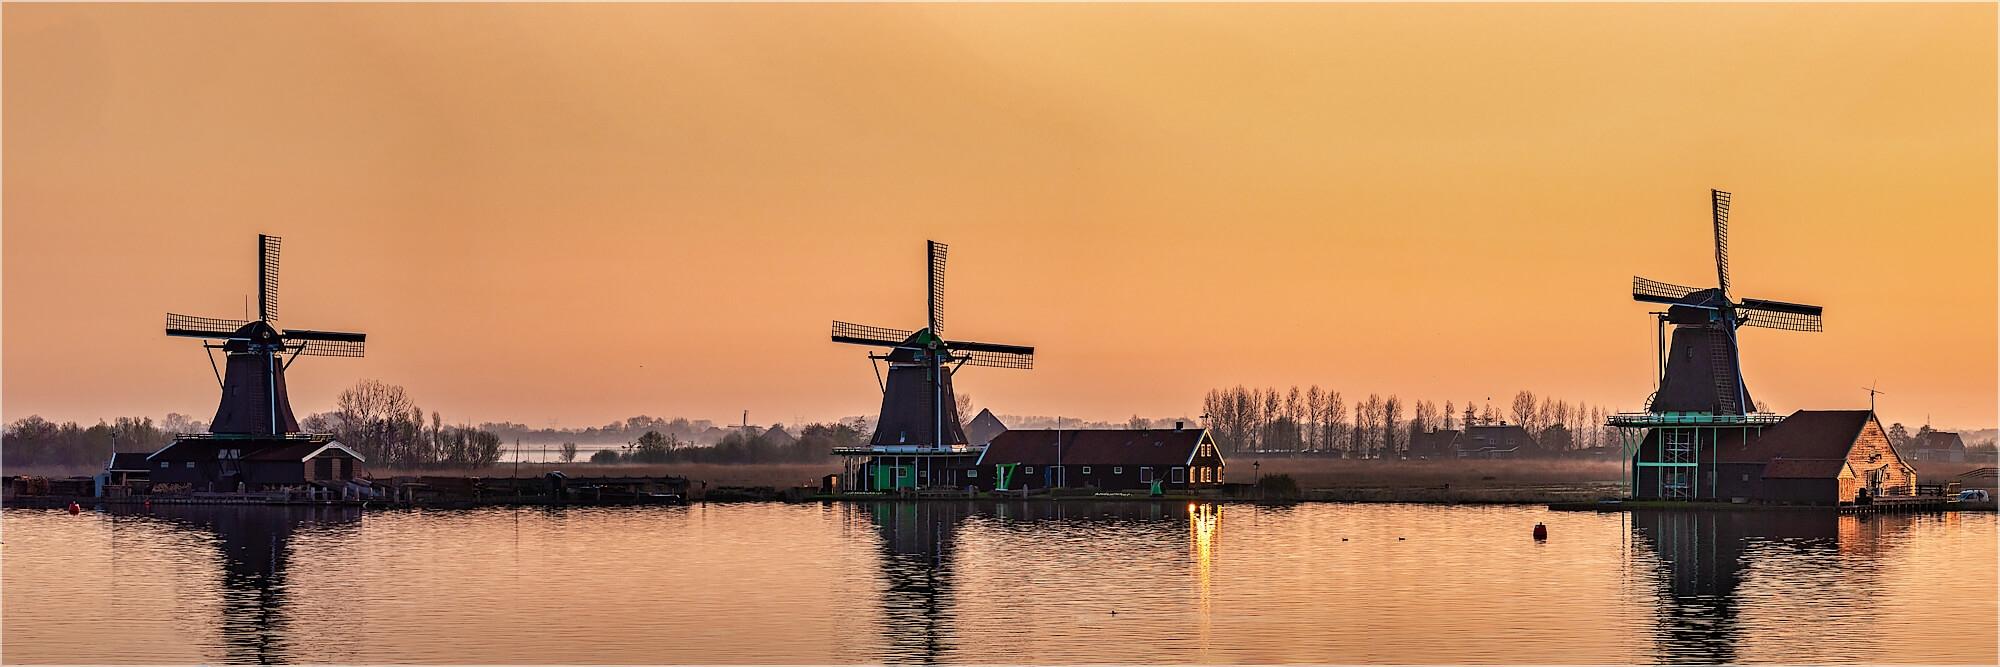 Panoramafoto Holland Windmühlen im Sonnenaufgang